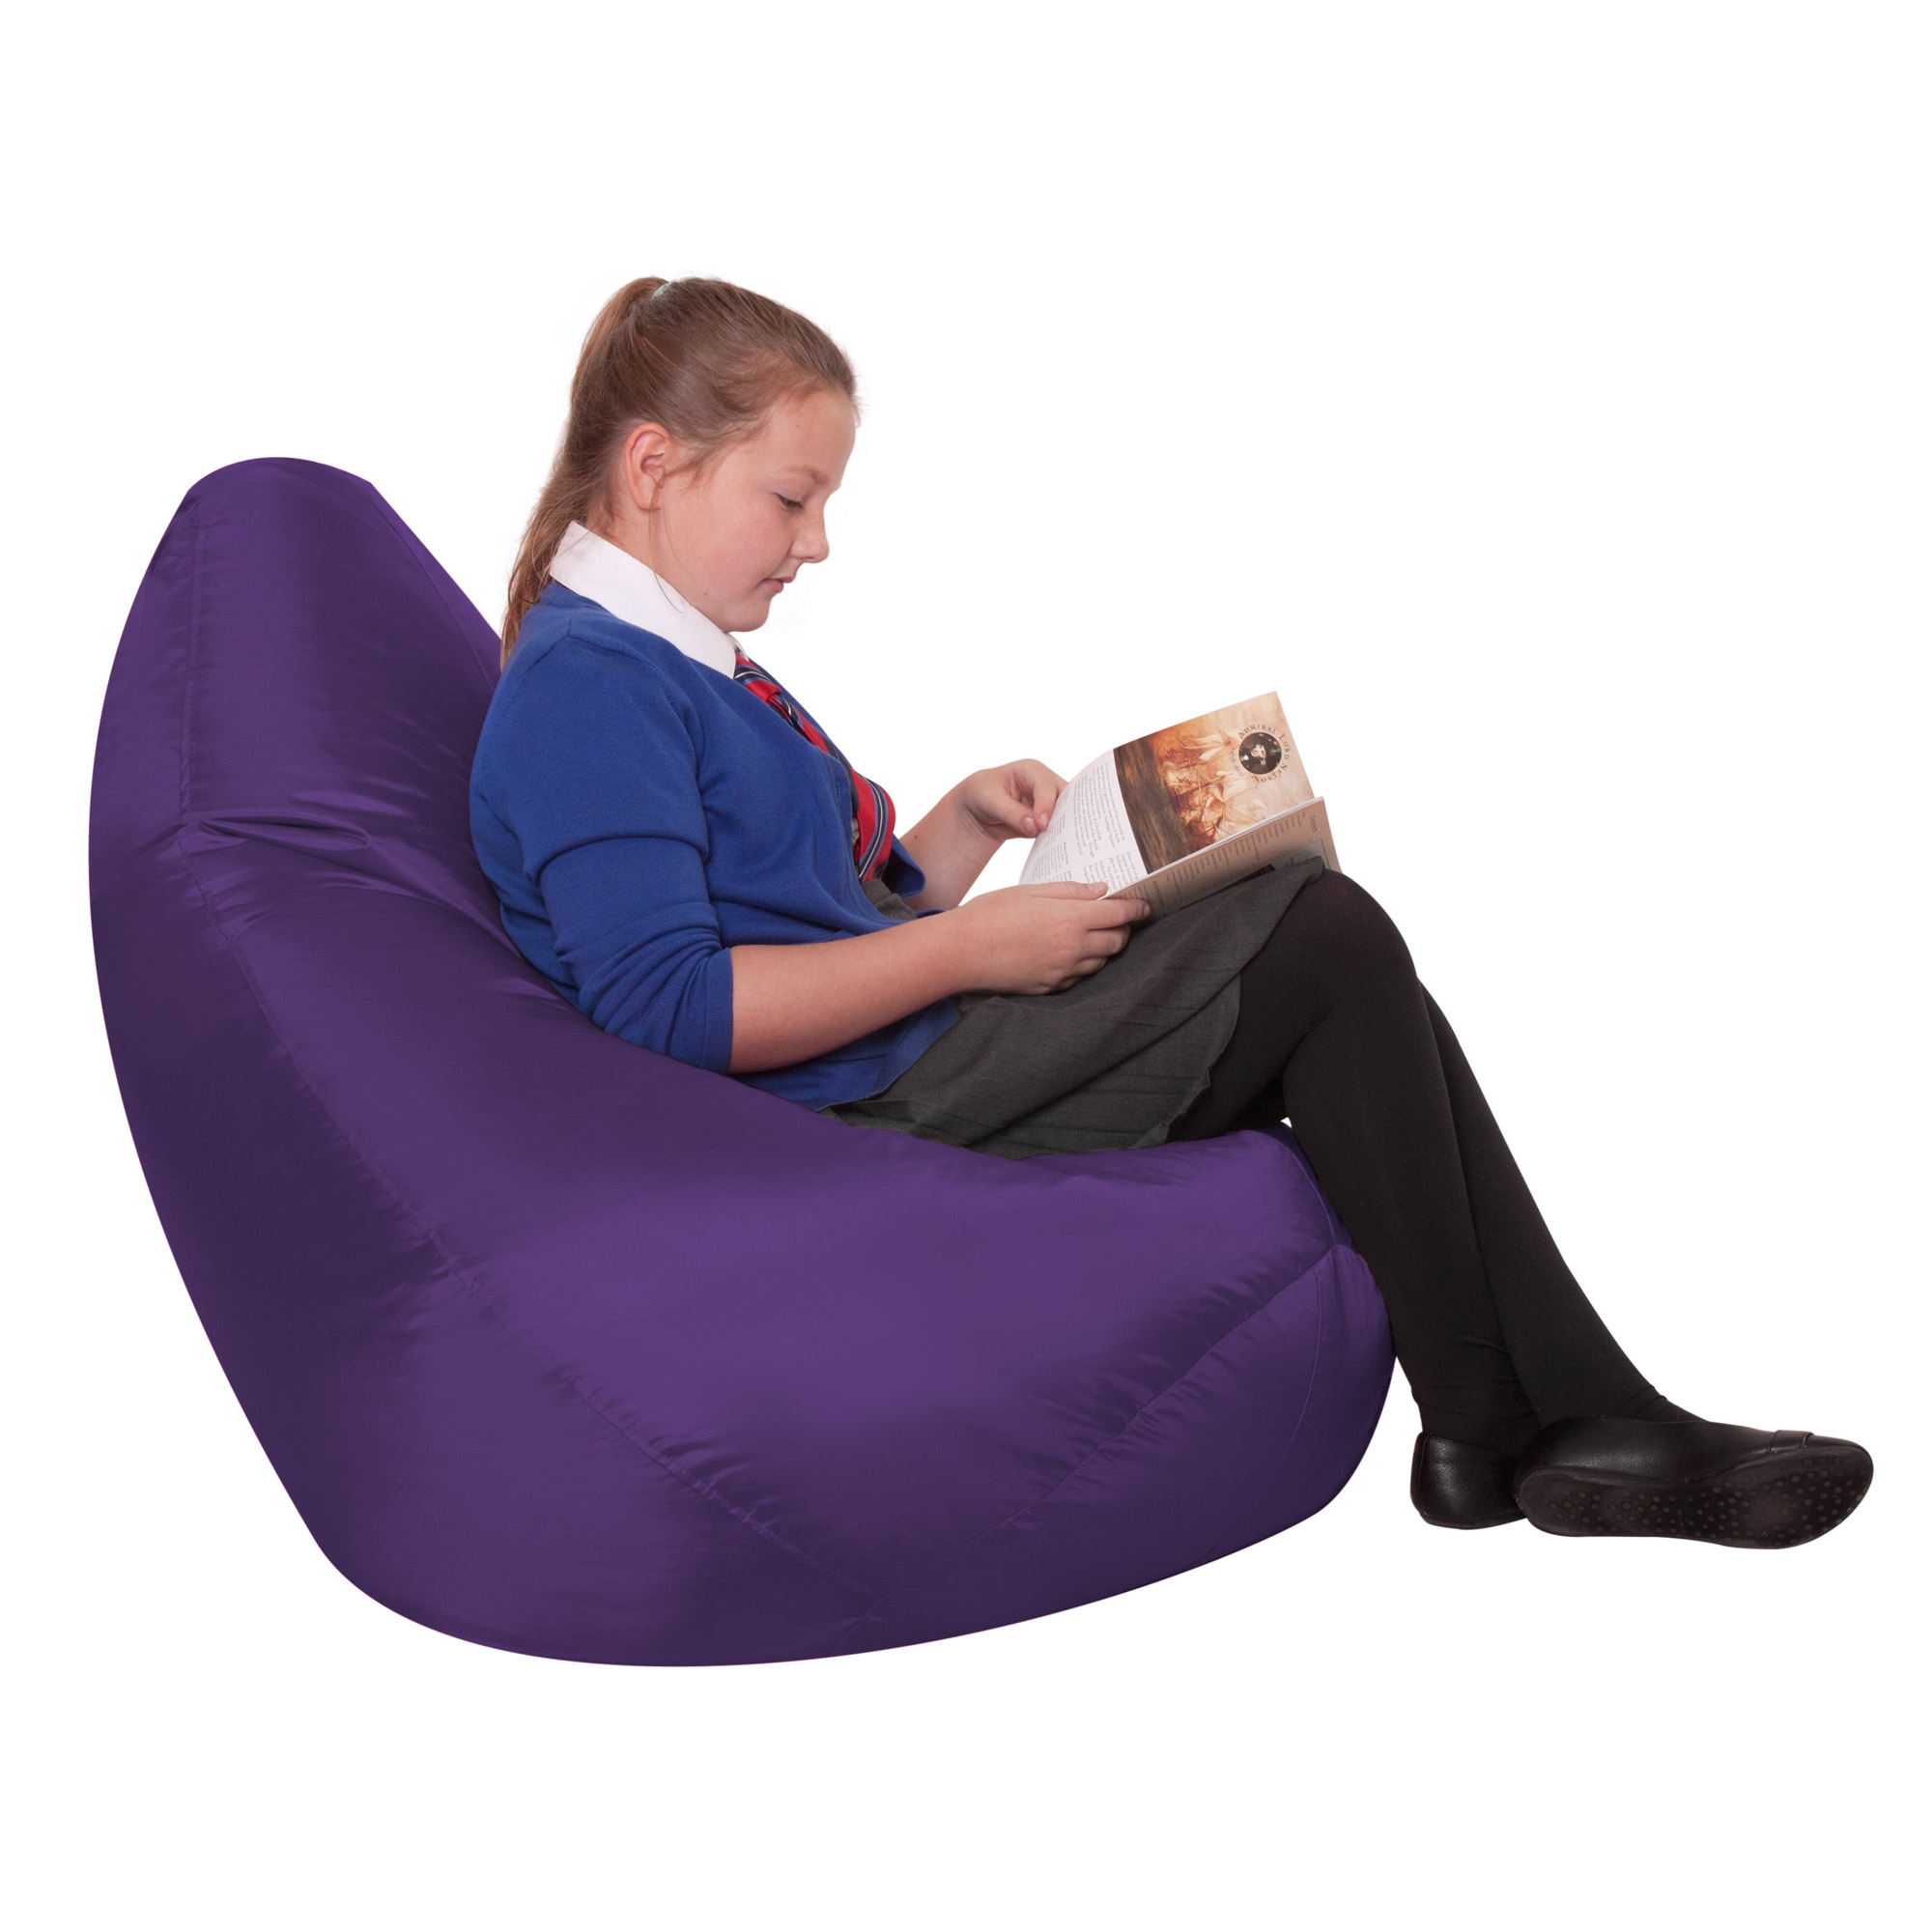 Eden-Large-Reading-Pod-OD-purple-300dpi-1